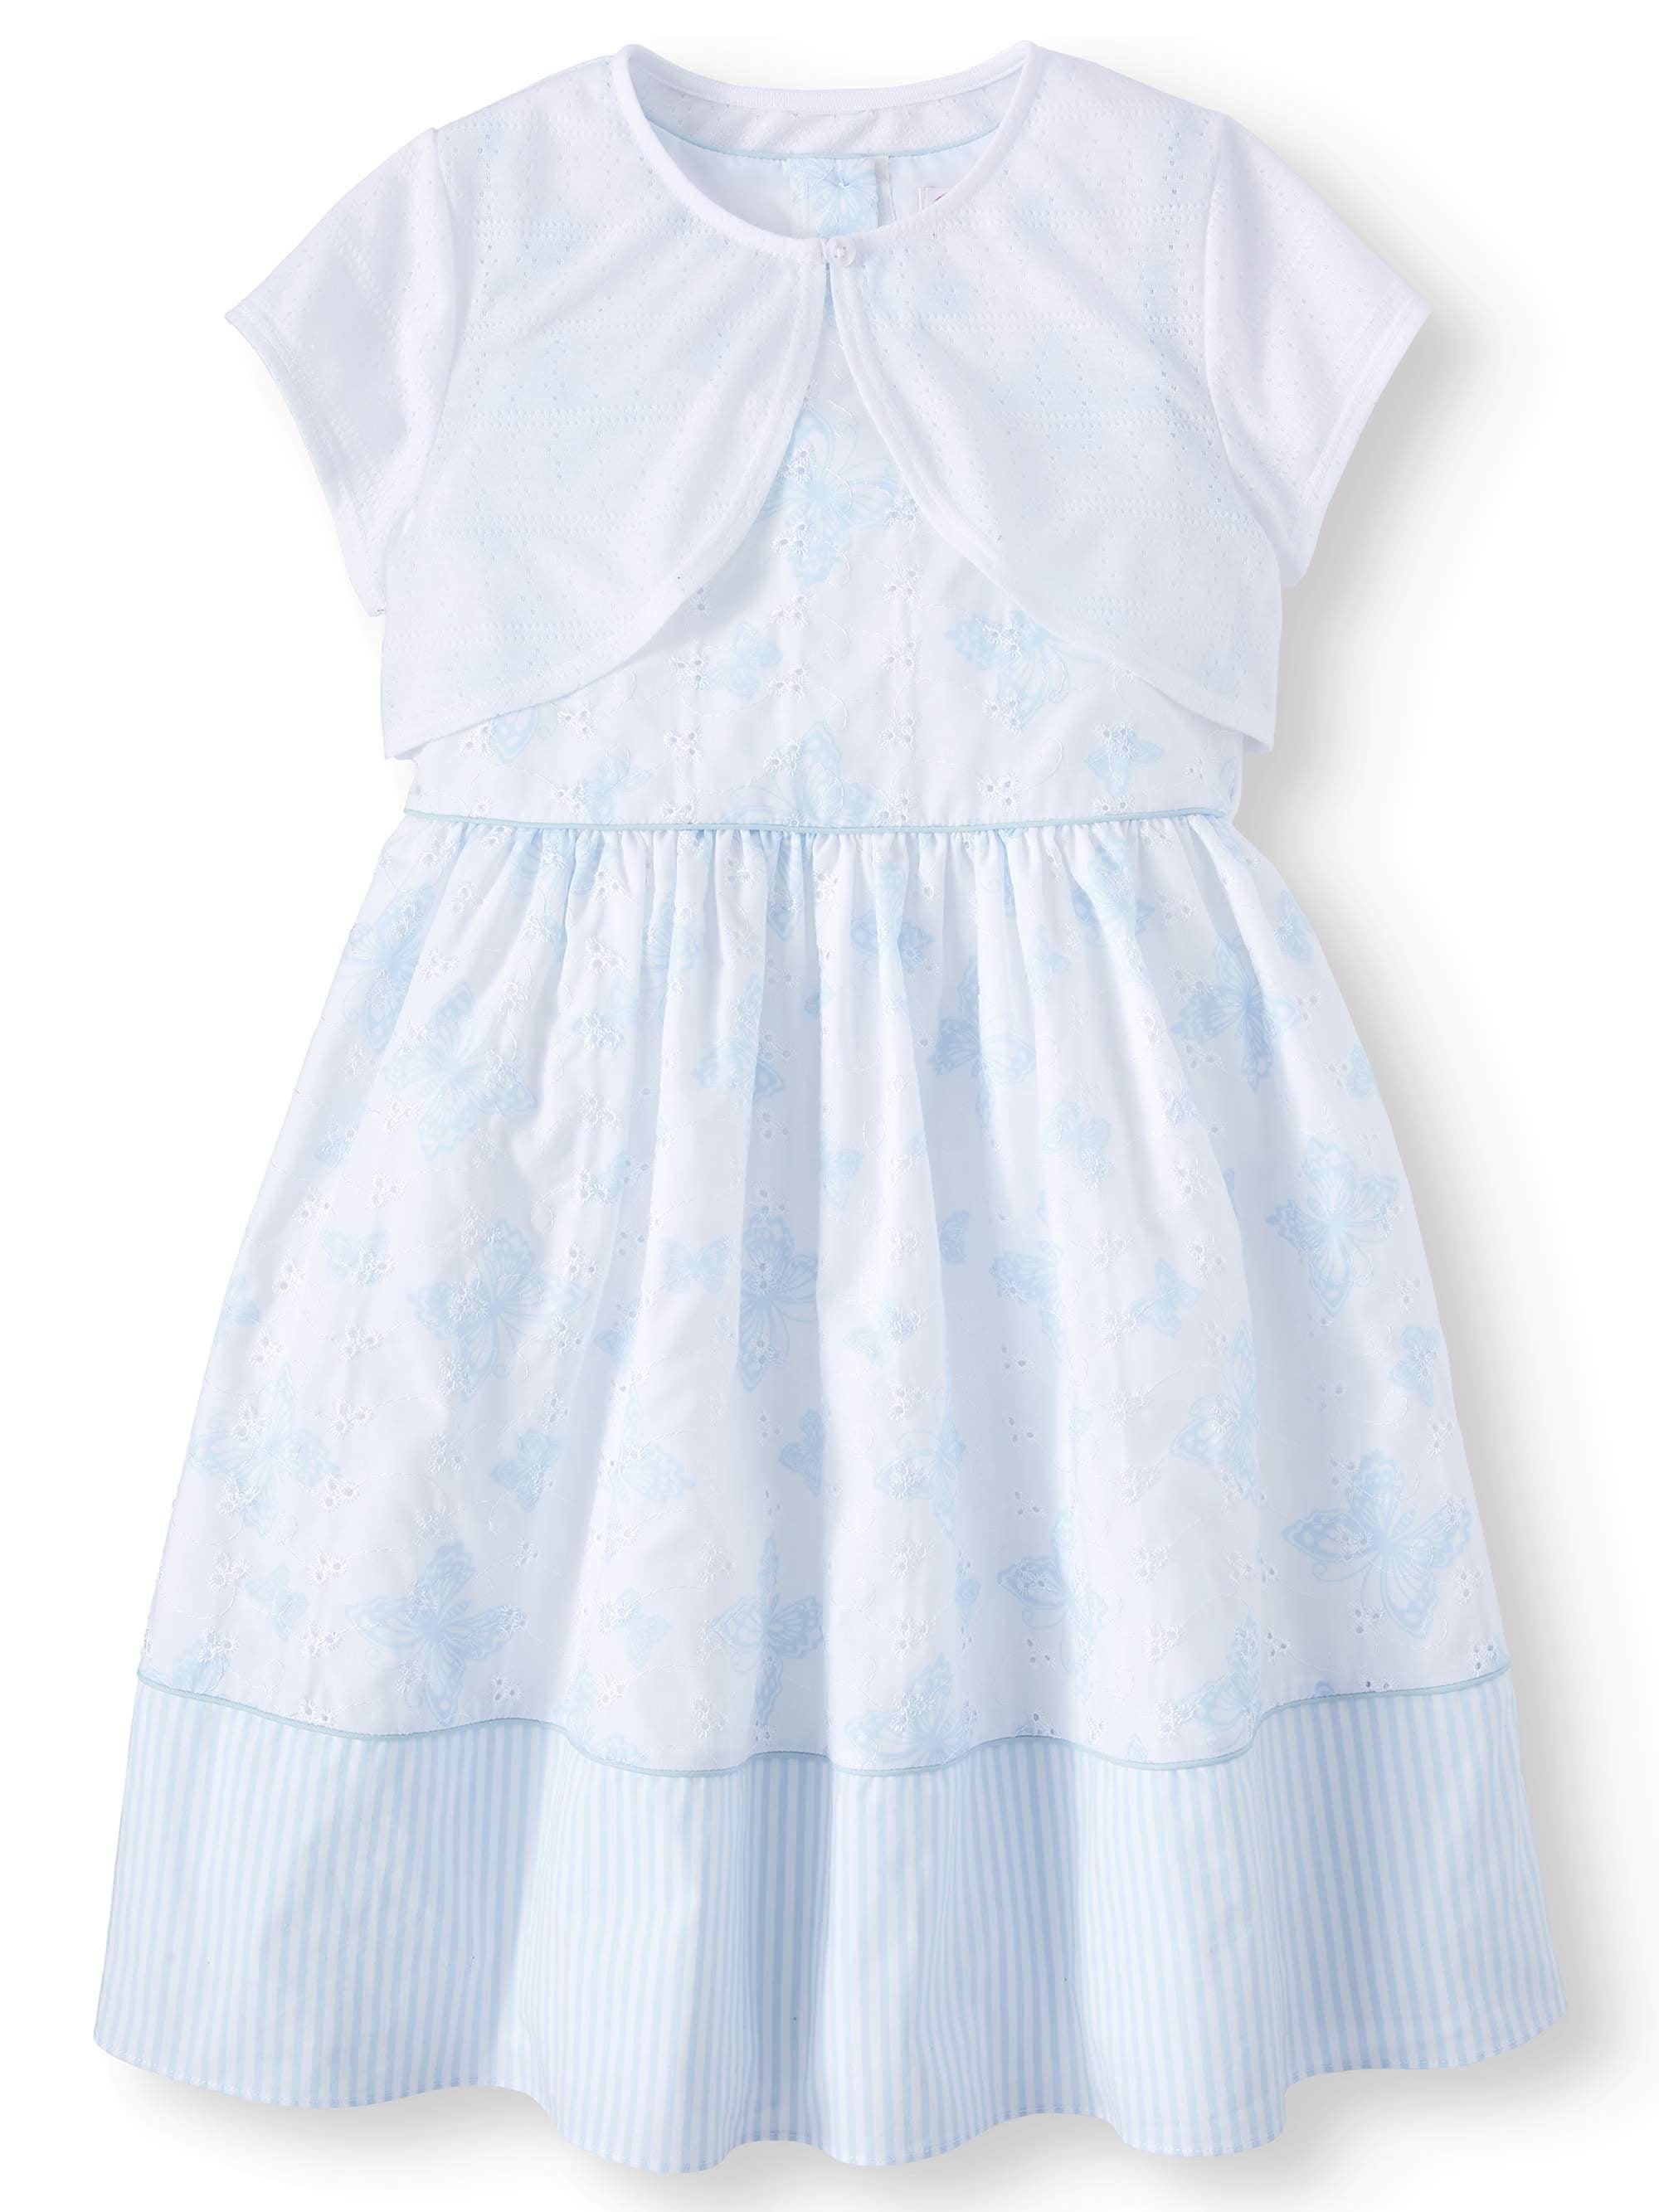 Girls' Printed Eyelet Easter Dress and Pointelle Shrug, 2-Piece Set